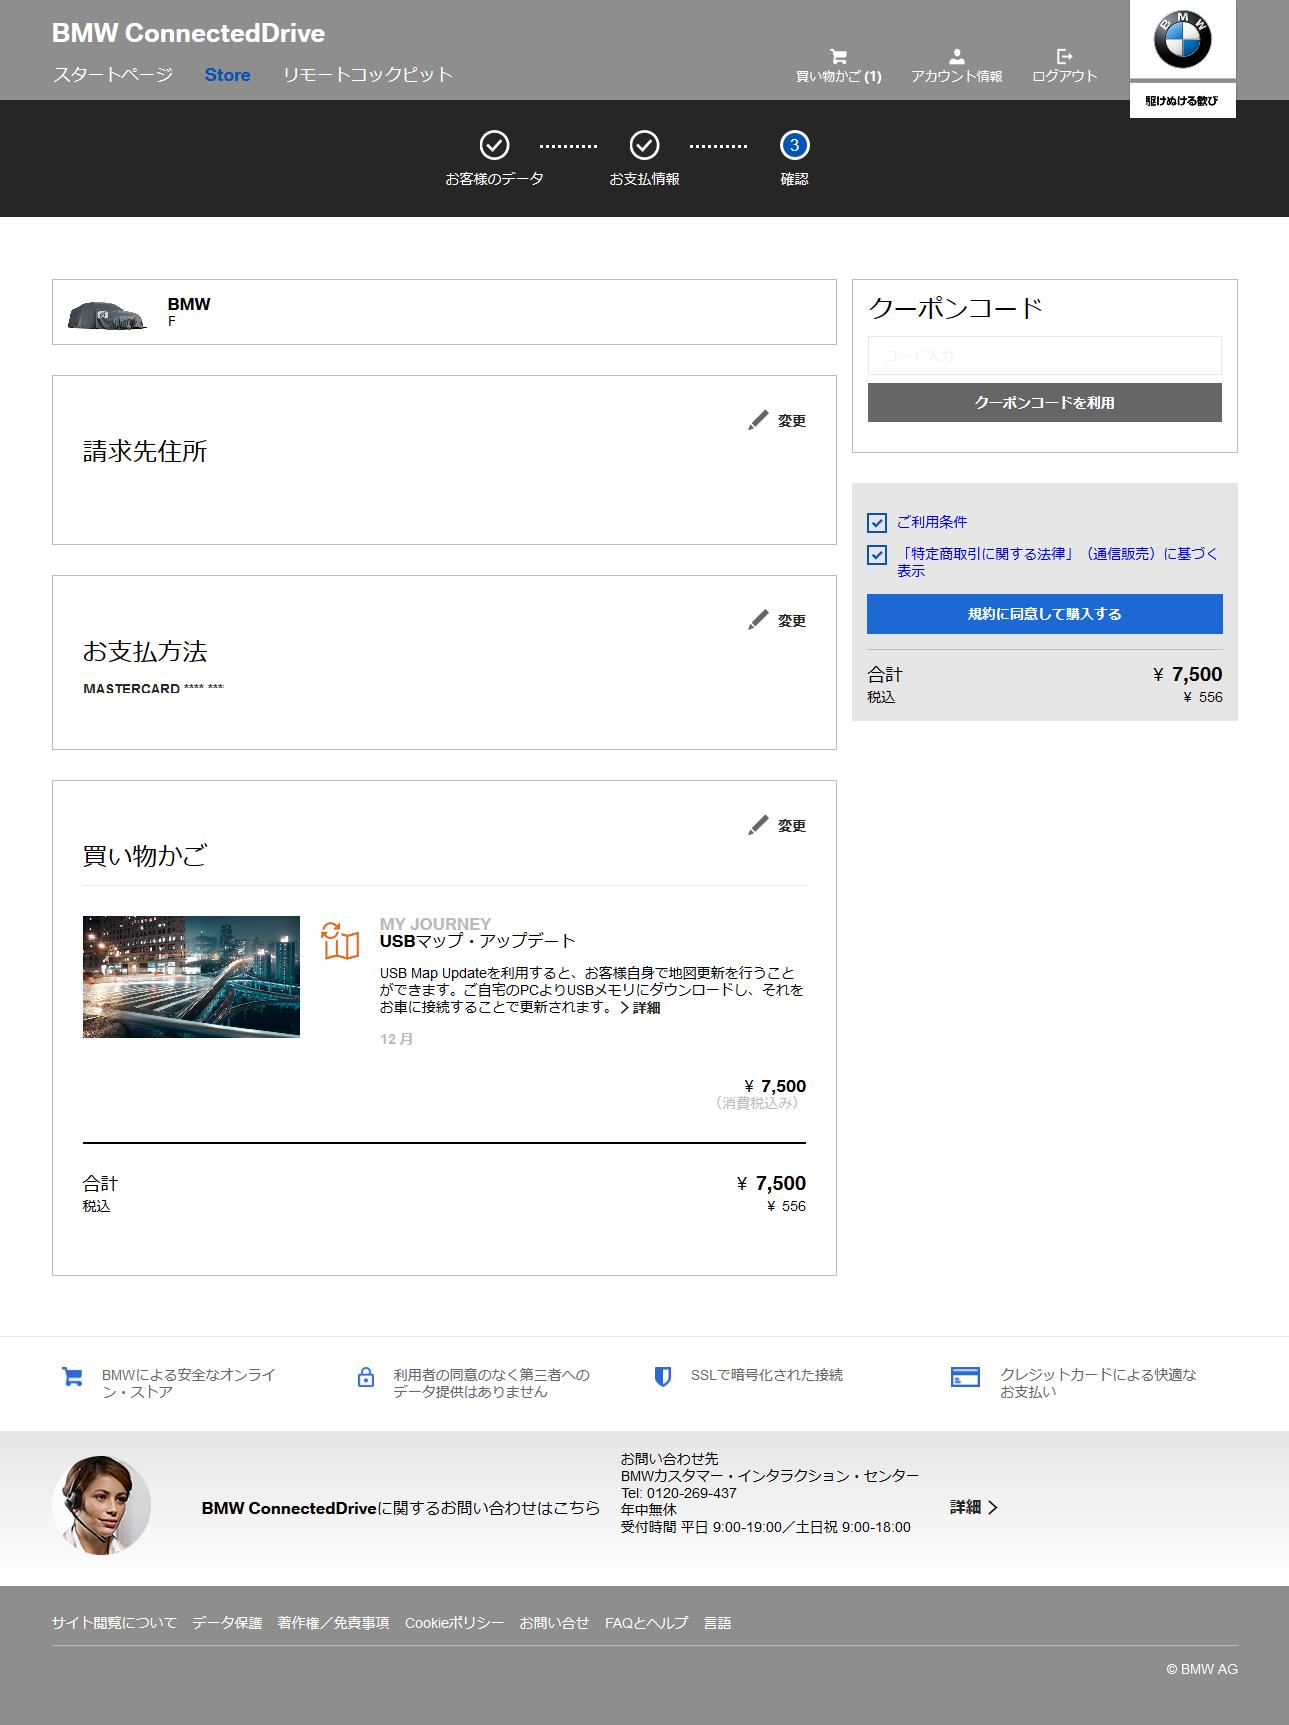 BMWコネクテッドドライブ USBマップ・アップデートの契約更新しましたが・・・